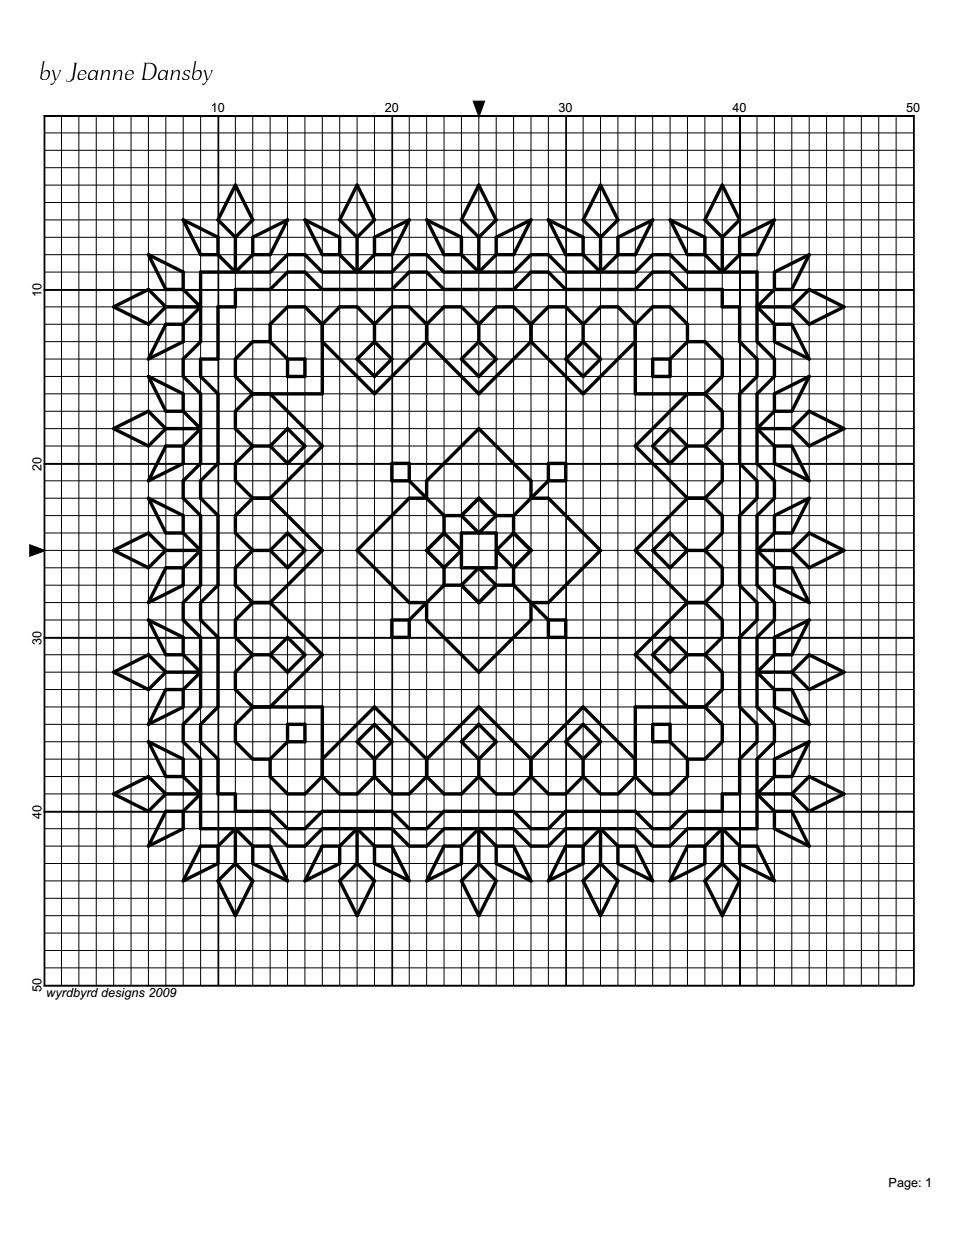 Blackwork Pattern (square) - by Jeanne Dansby {wyrdbyrd designs ...